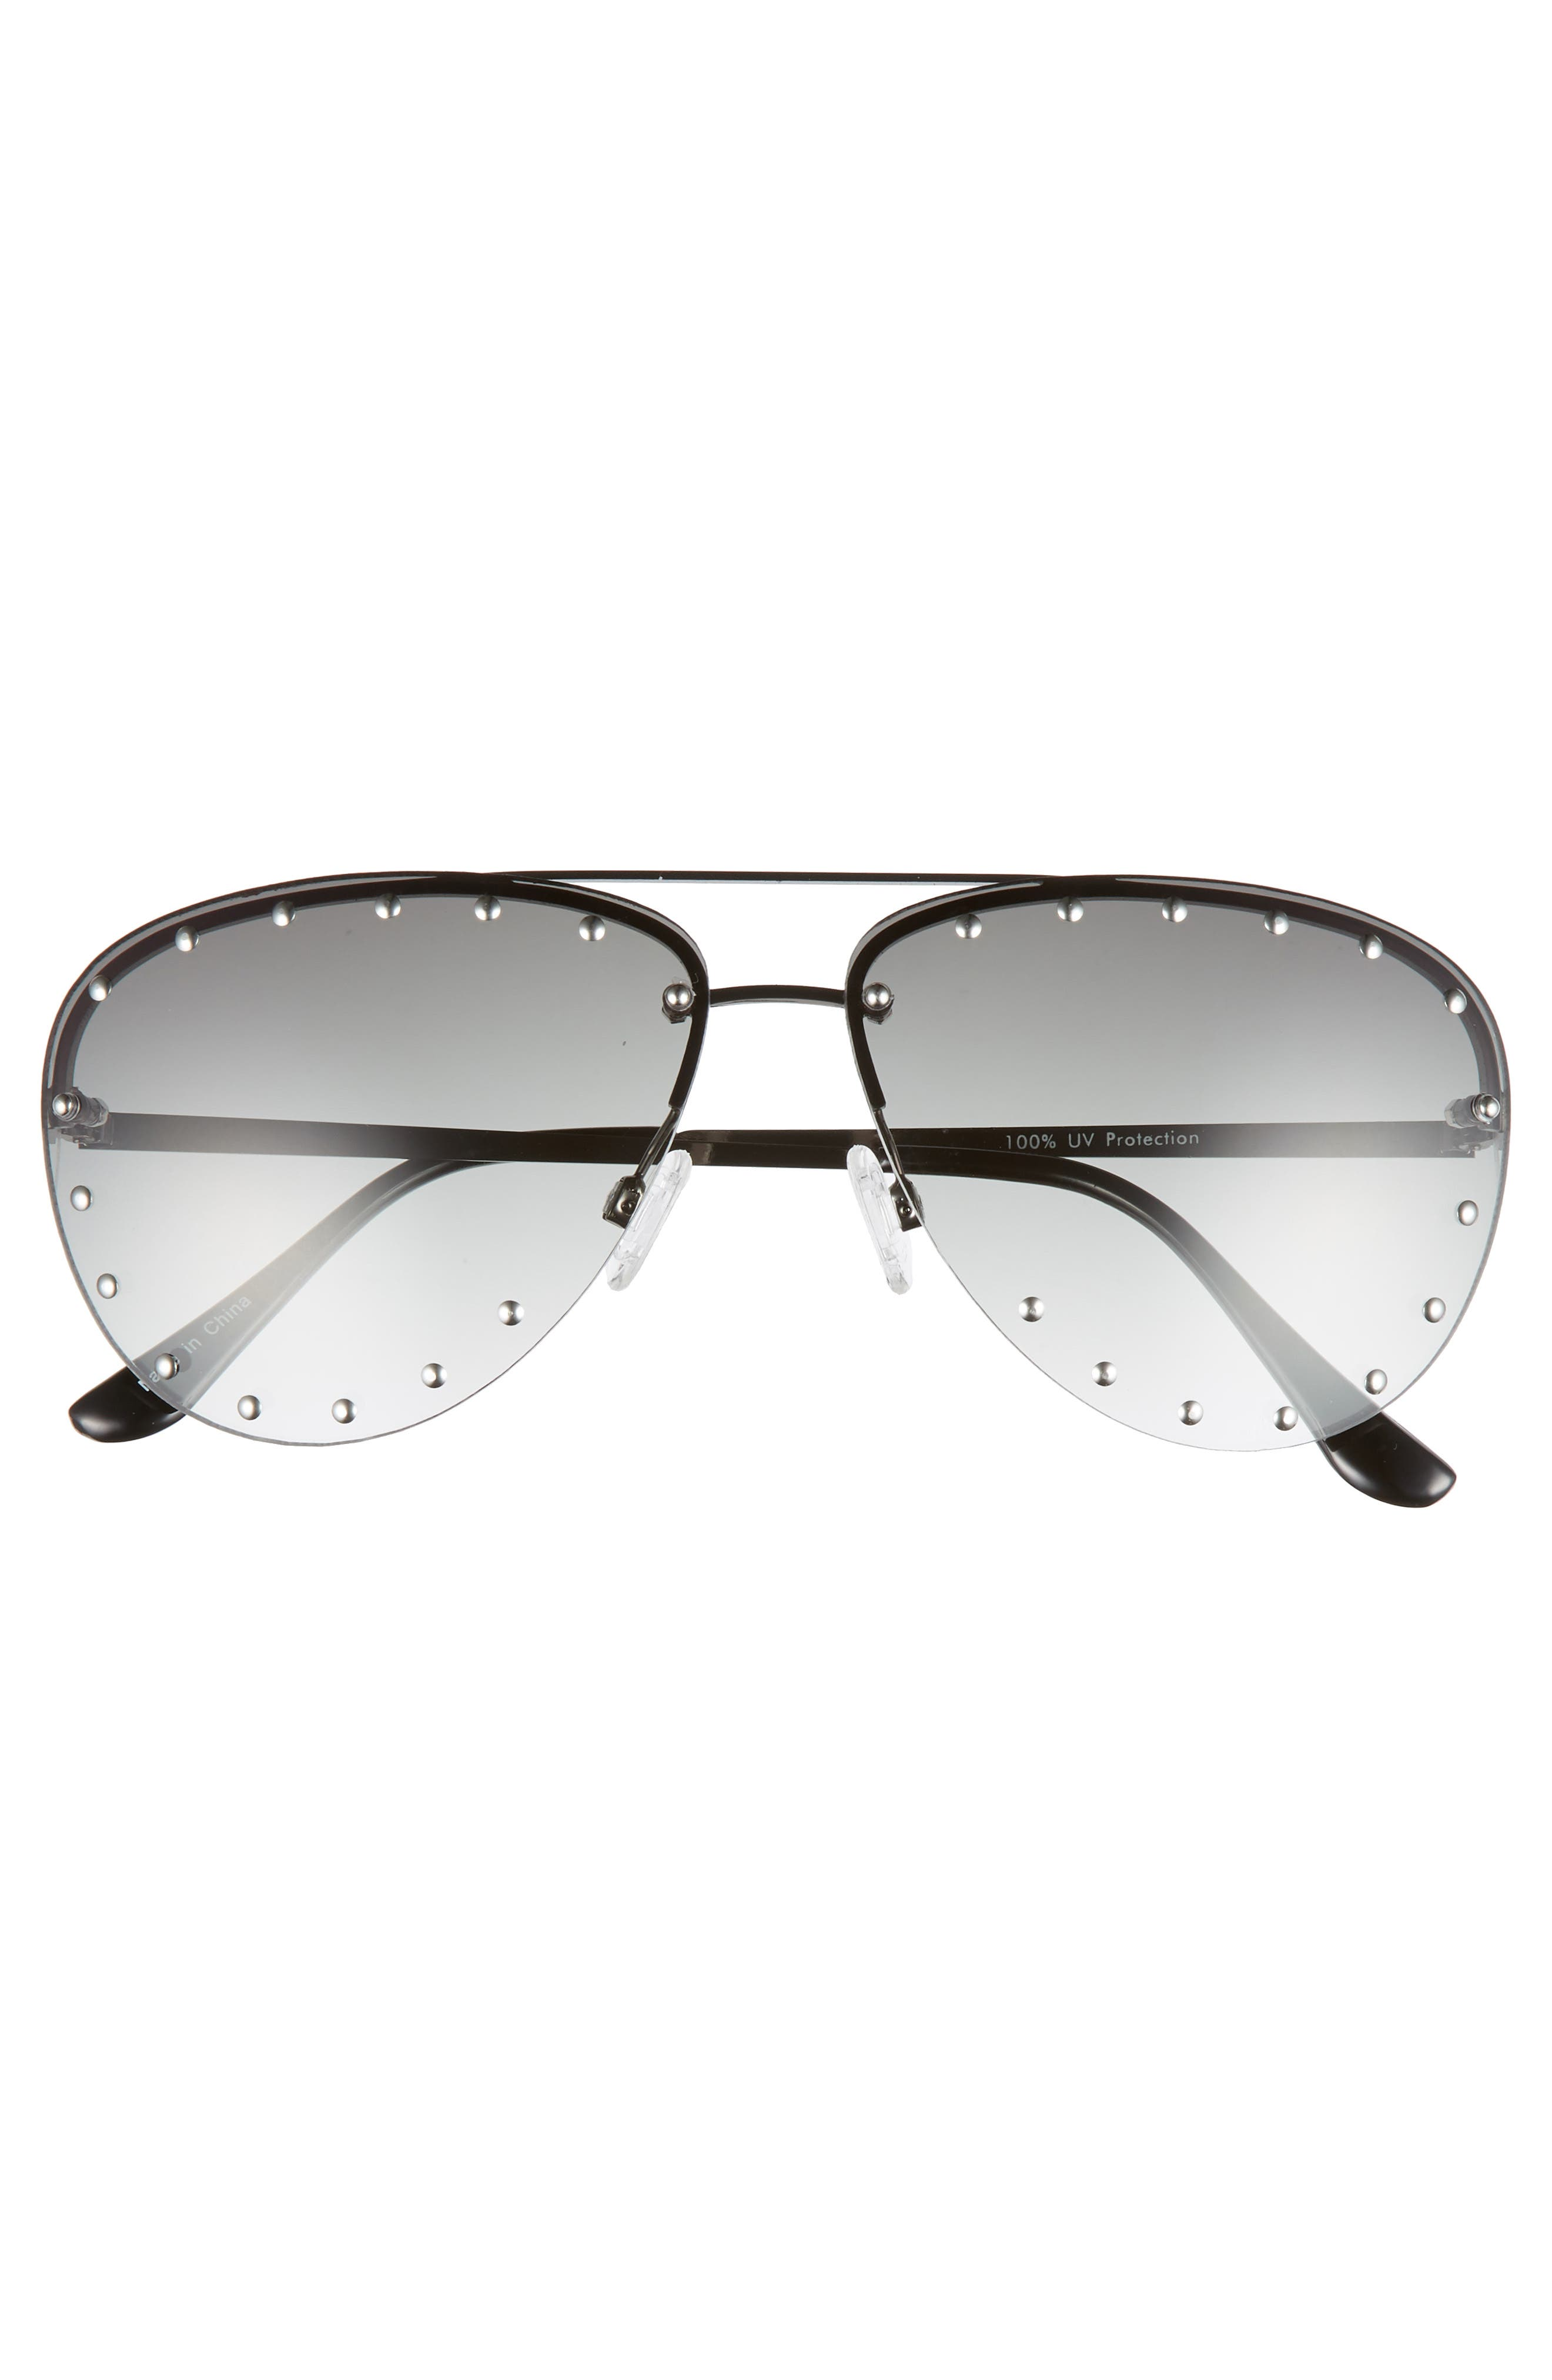 63mm Studded Aviator Sunglasses,                             Alternate thumbnail 5, color,